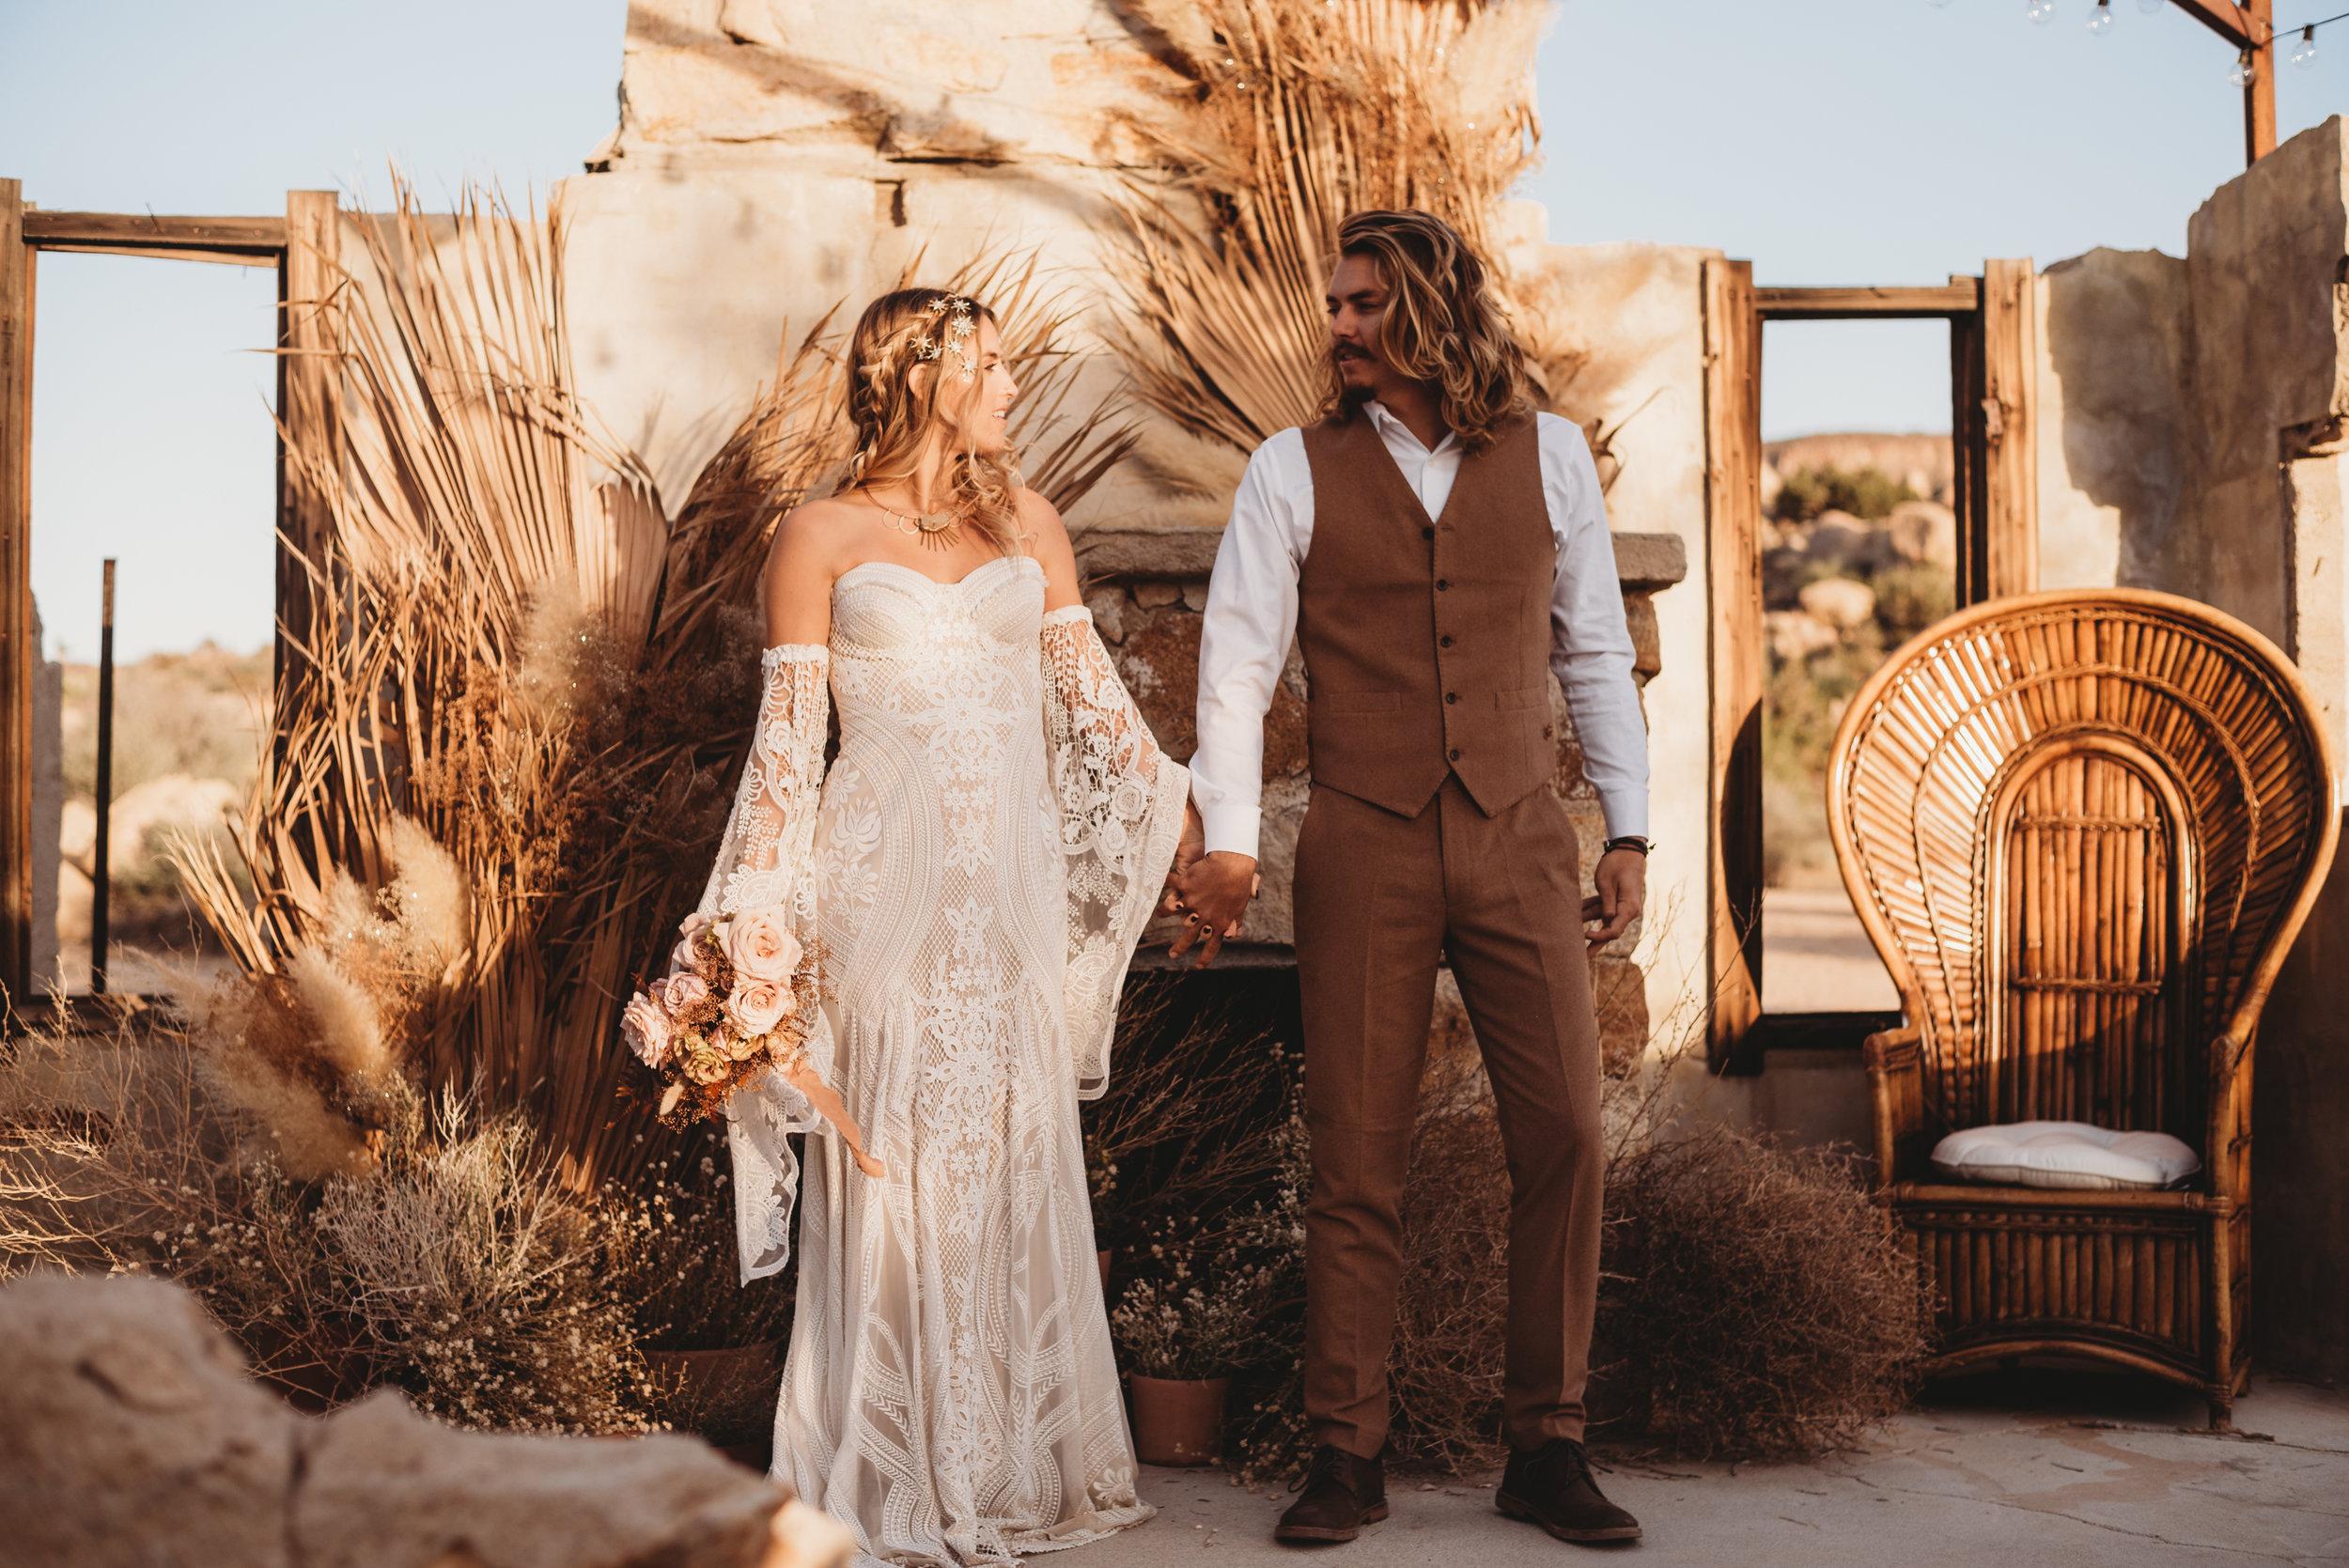 FortSt.John_photographer_TyraEPhotography_Wedding_Couple_Family_Photograhy_DawsonCreek_Elopement_Bride_Boduoir_Portraits-8238.jpg